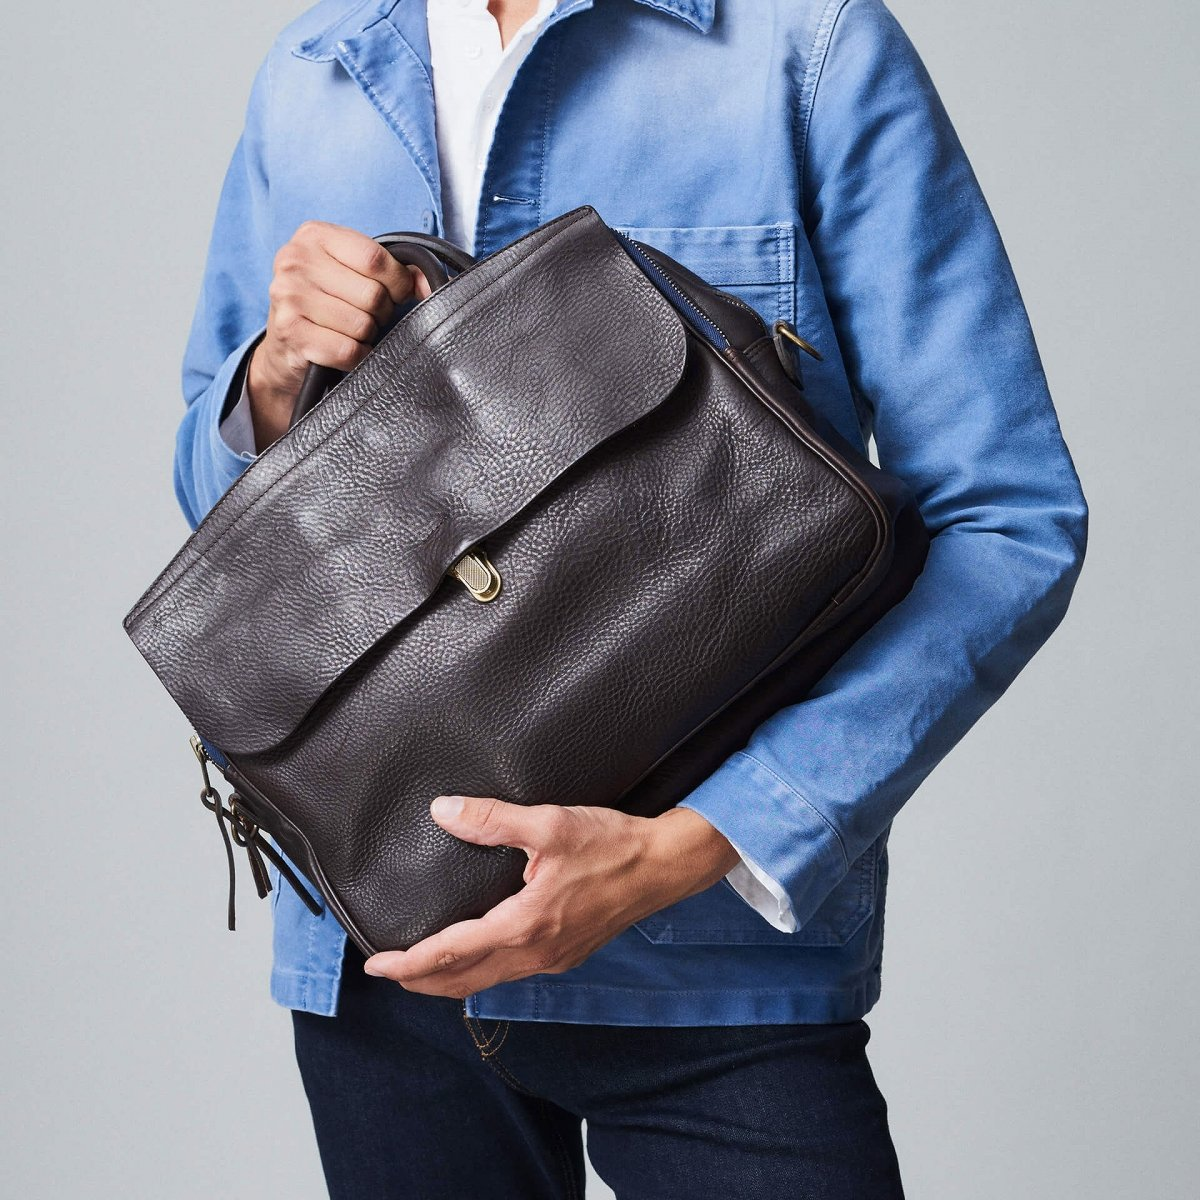 Zeppo Business bag - Dark Brown / E Pure (image n°8)